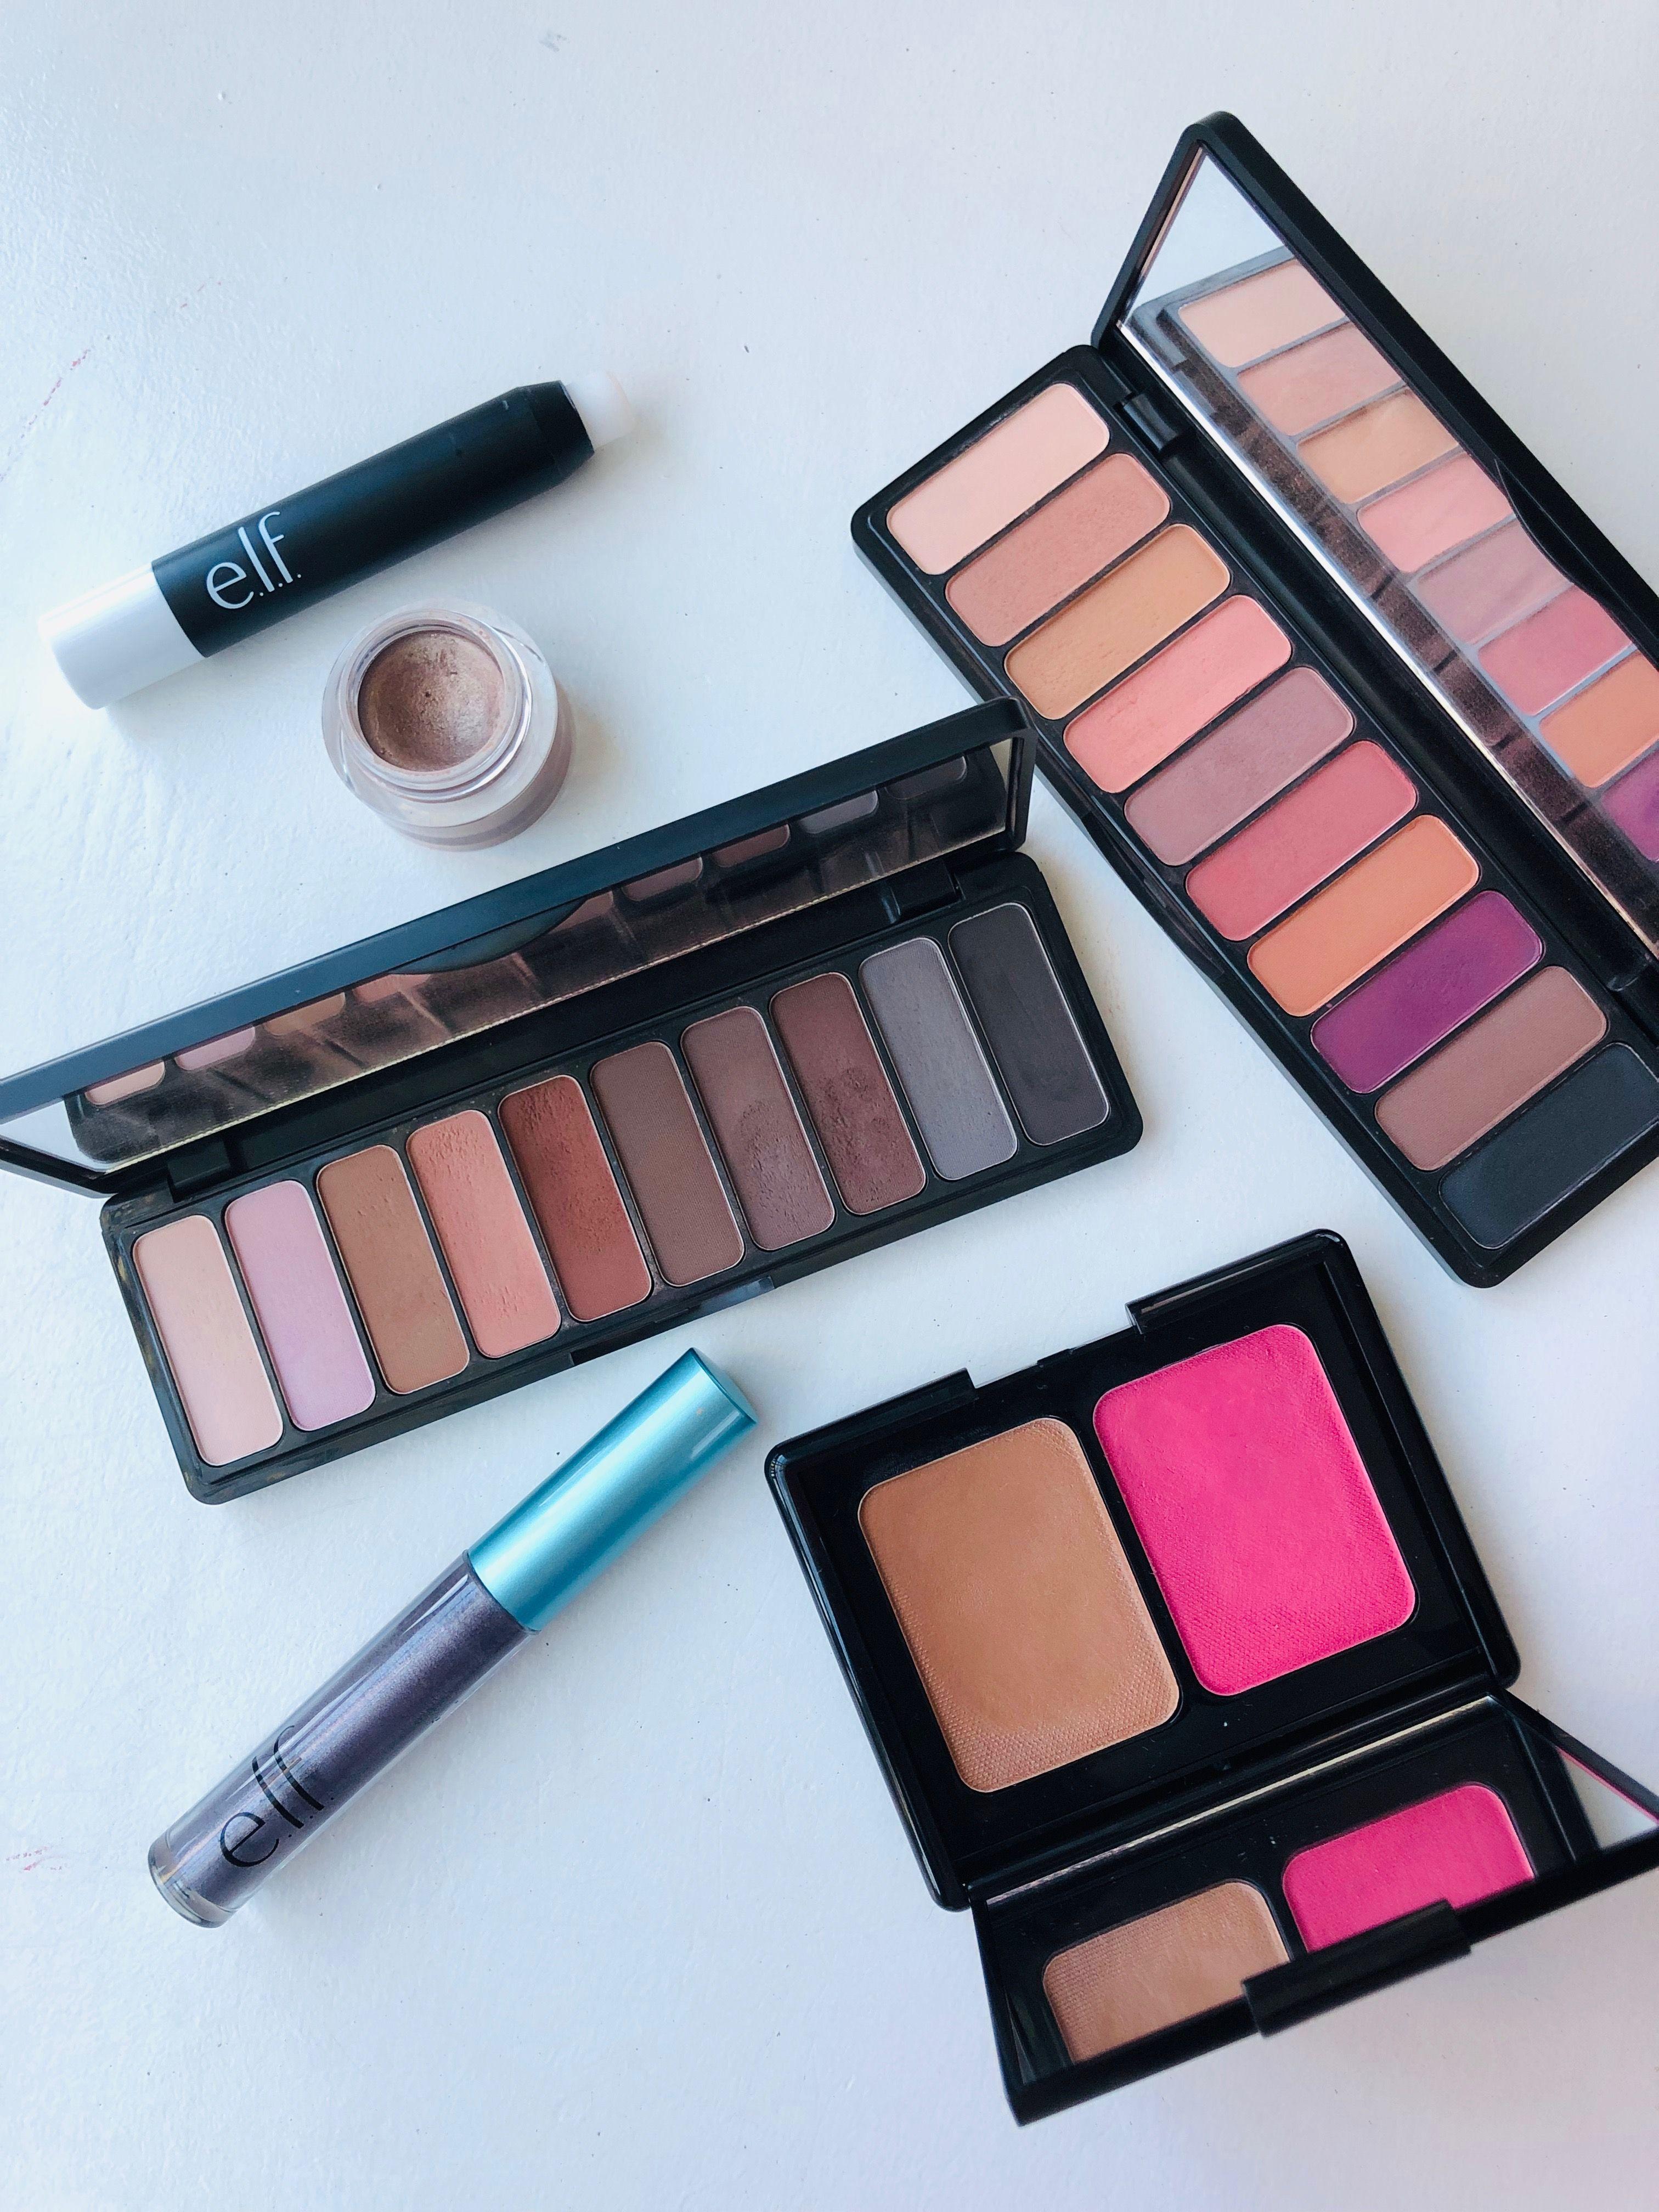 Elf Cosmetics Matte Blotting Mist Review & Wear Test